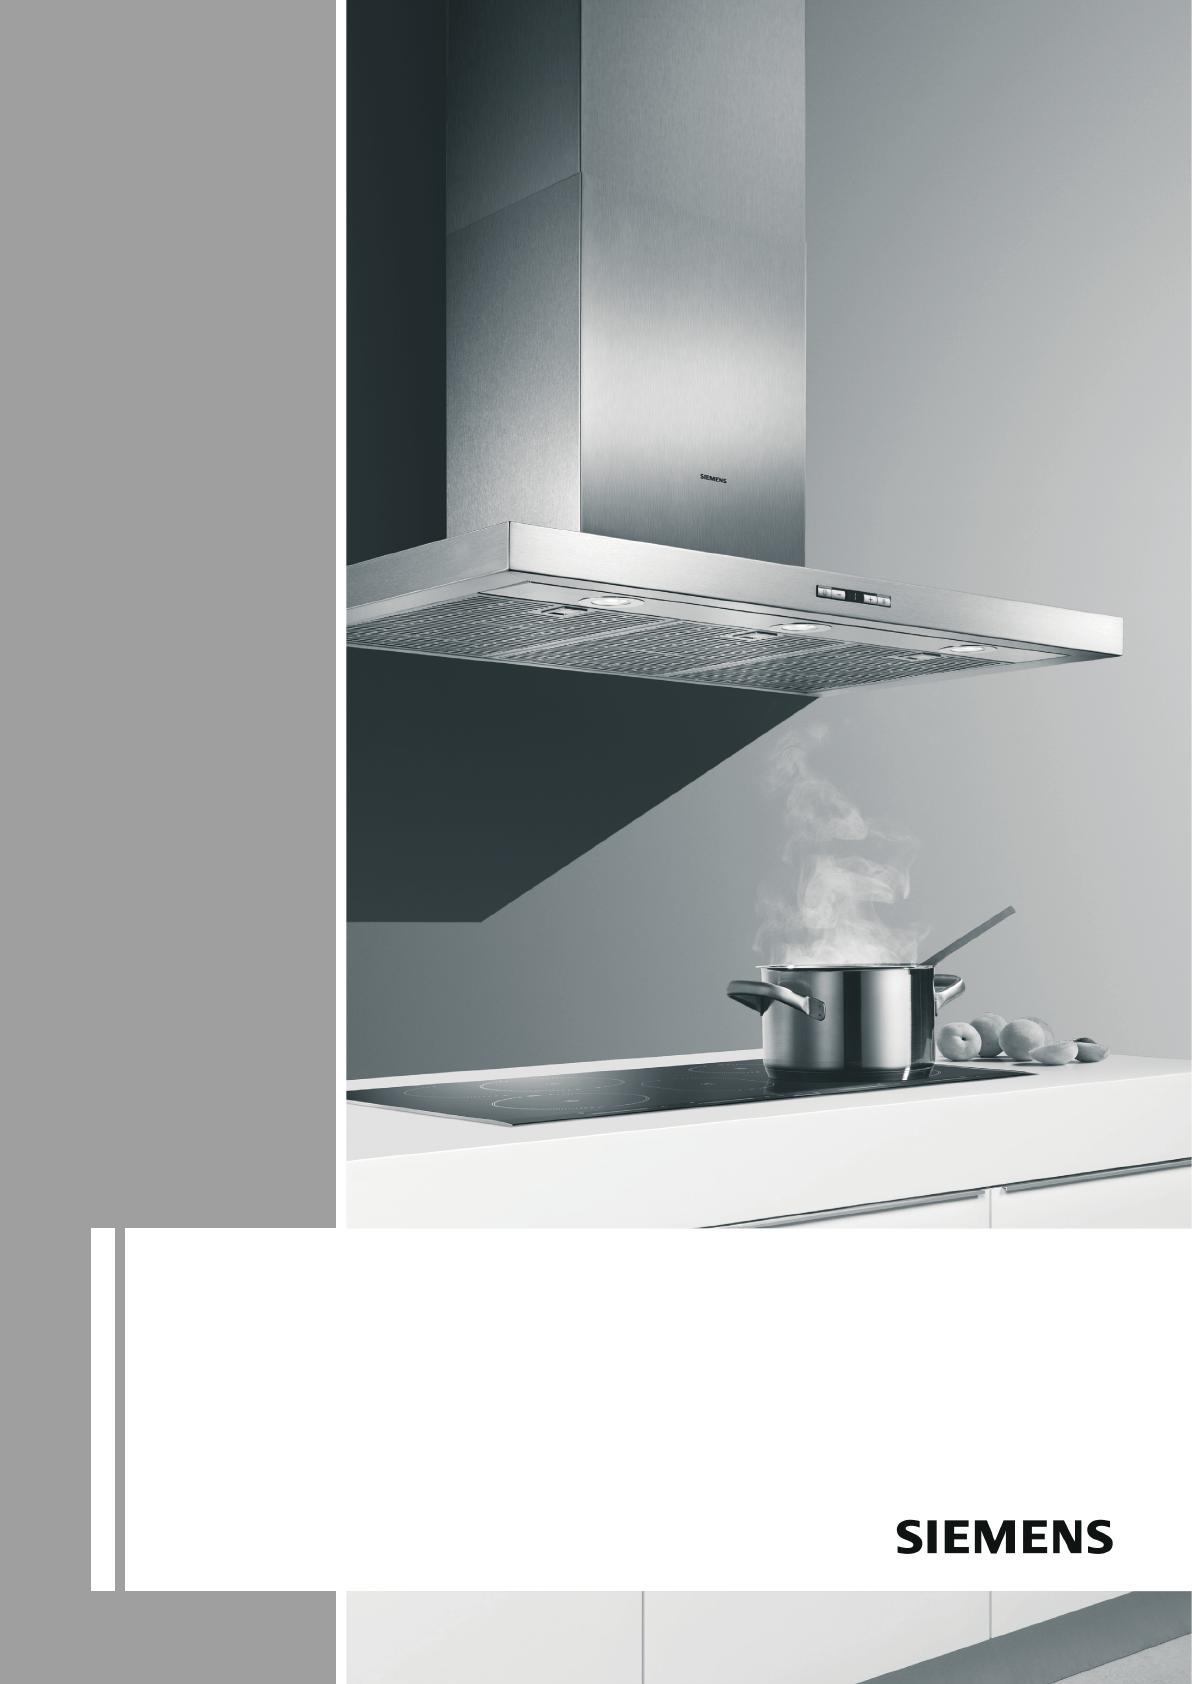 handleiding siemens lc97wa532 pagina 1 van 16 nederlands. Black Bedroom Furniture Sets. Home Design Ideas